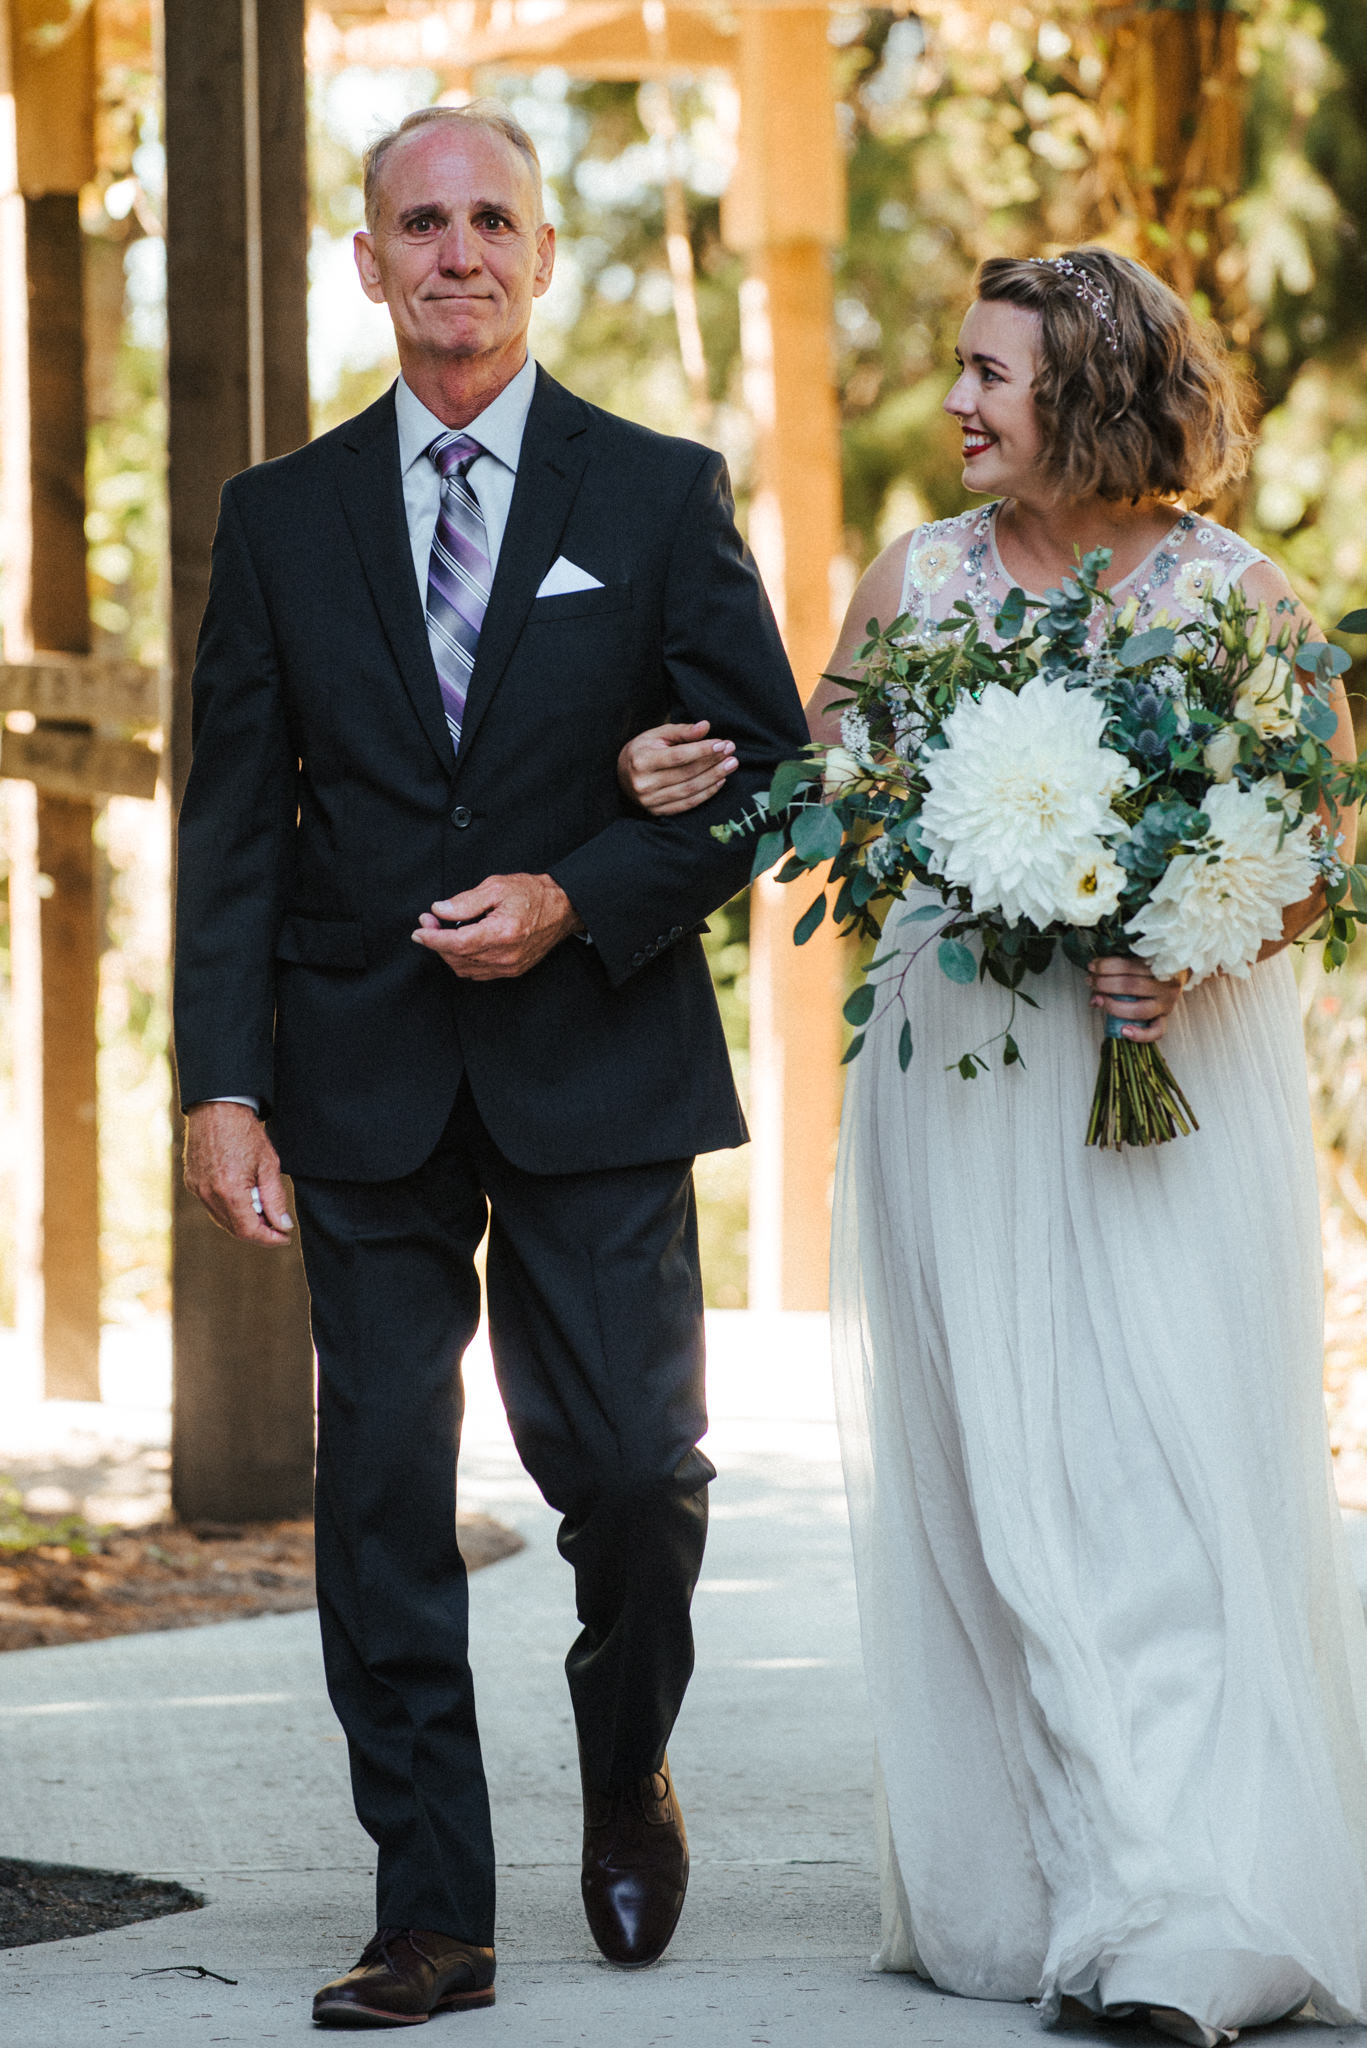 Amy Steven Seattle Wedding Photographer Vishal Goklani_037.jpg